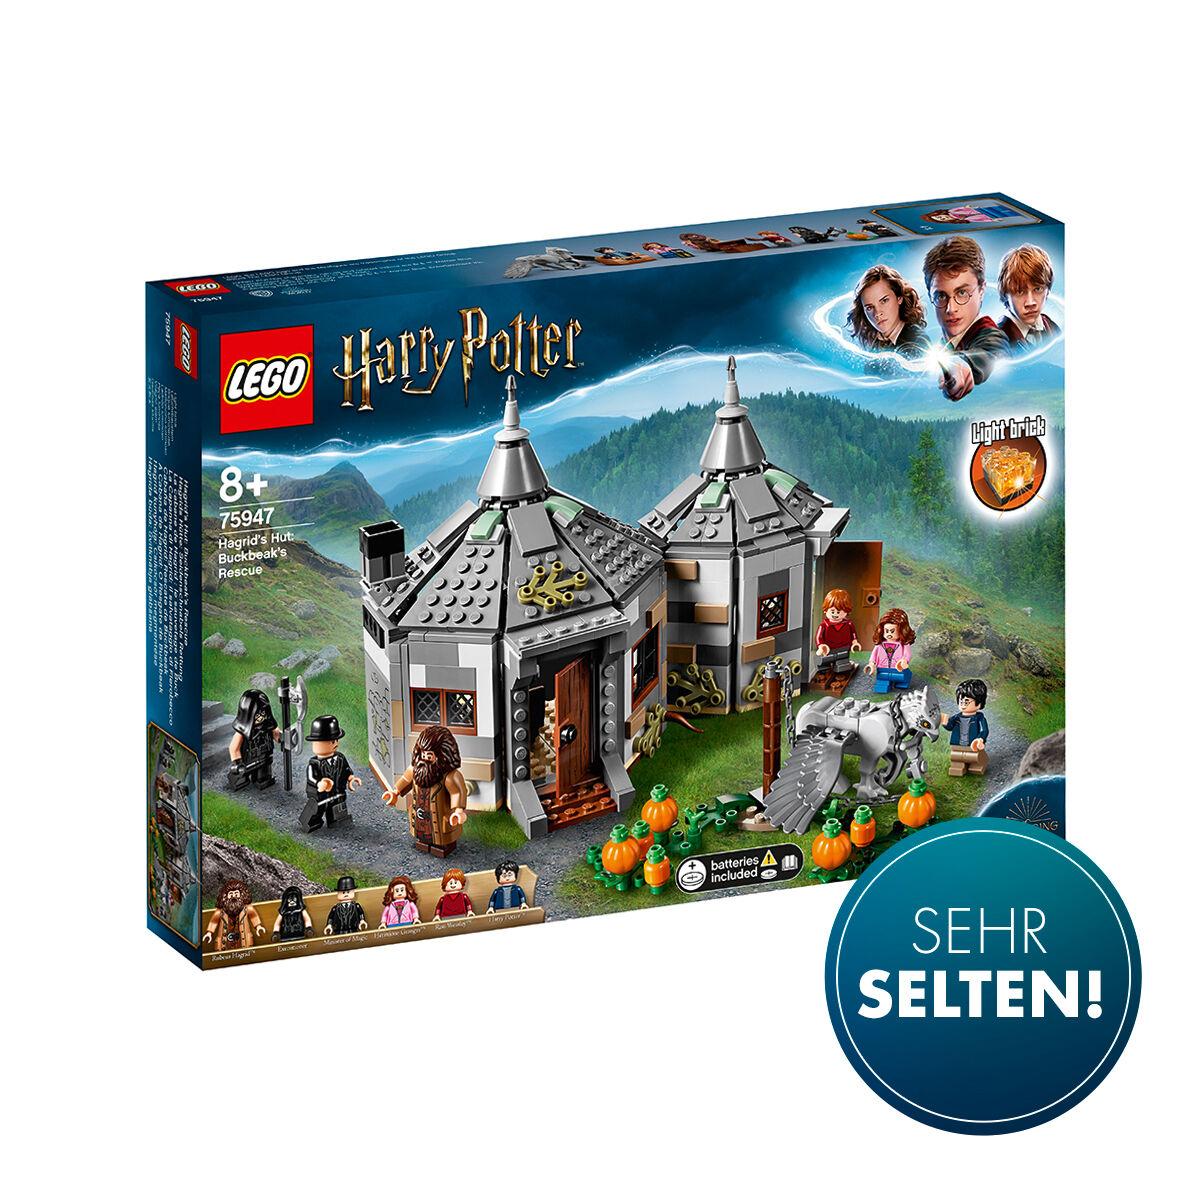 [Galeria] LEGO Ideas 21319 - FRIENDS Central Perk und Harry Potter - 75947